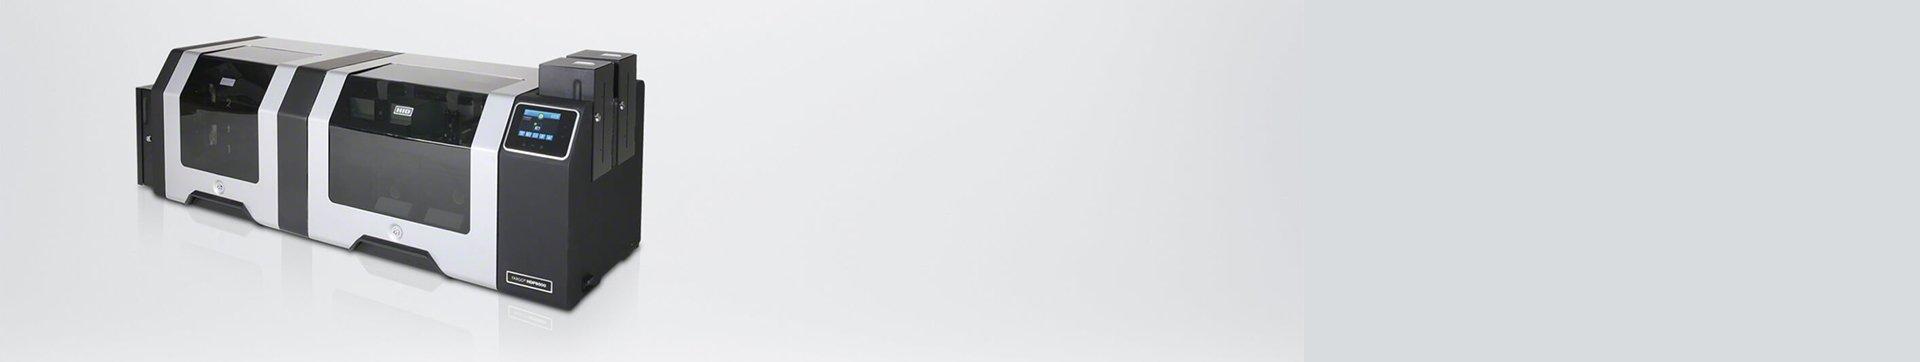 ID Stampaci - Fargo HDP8500 industrijski stampac kartica